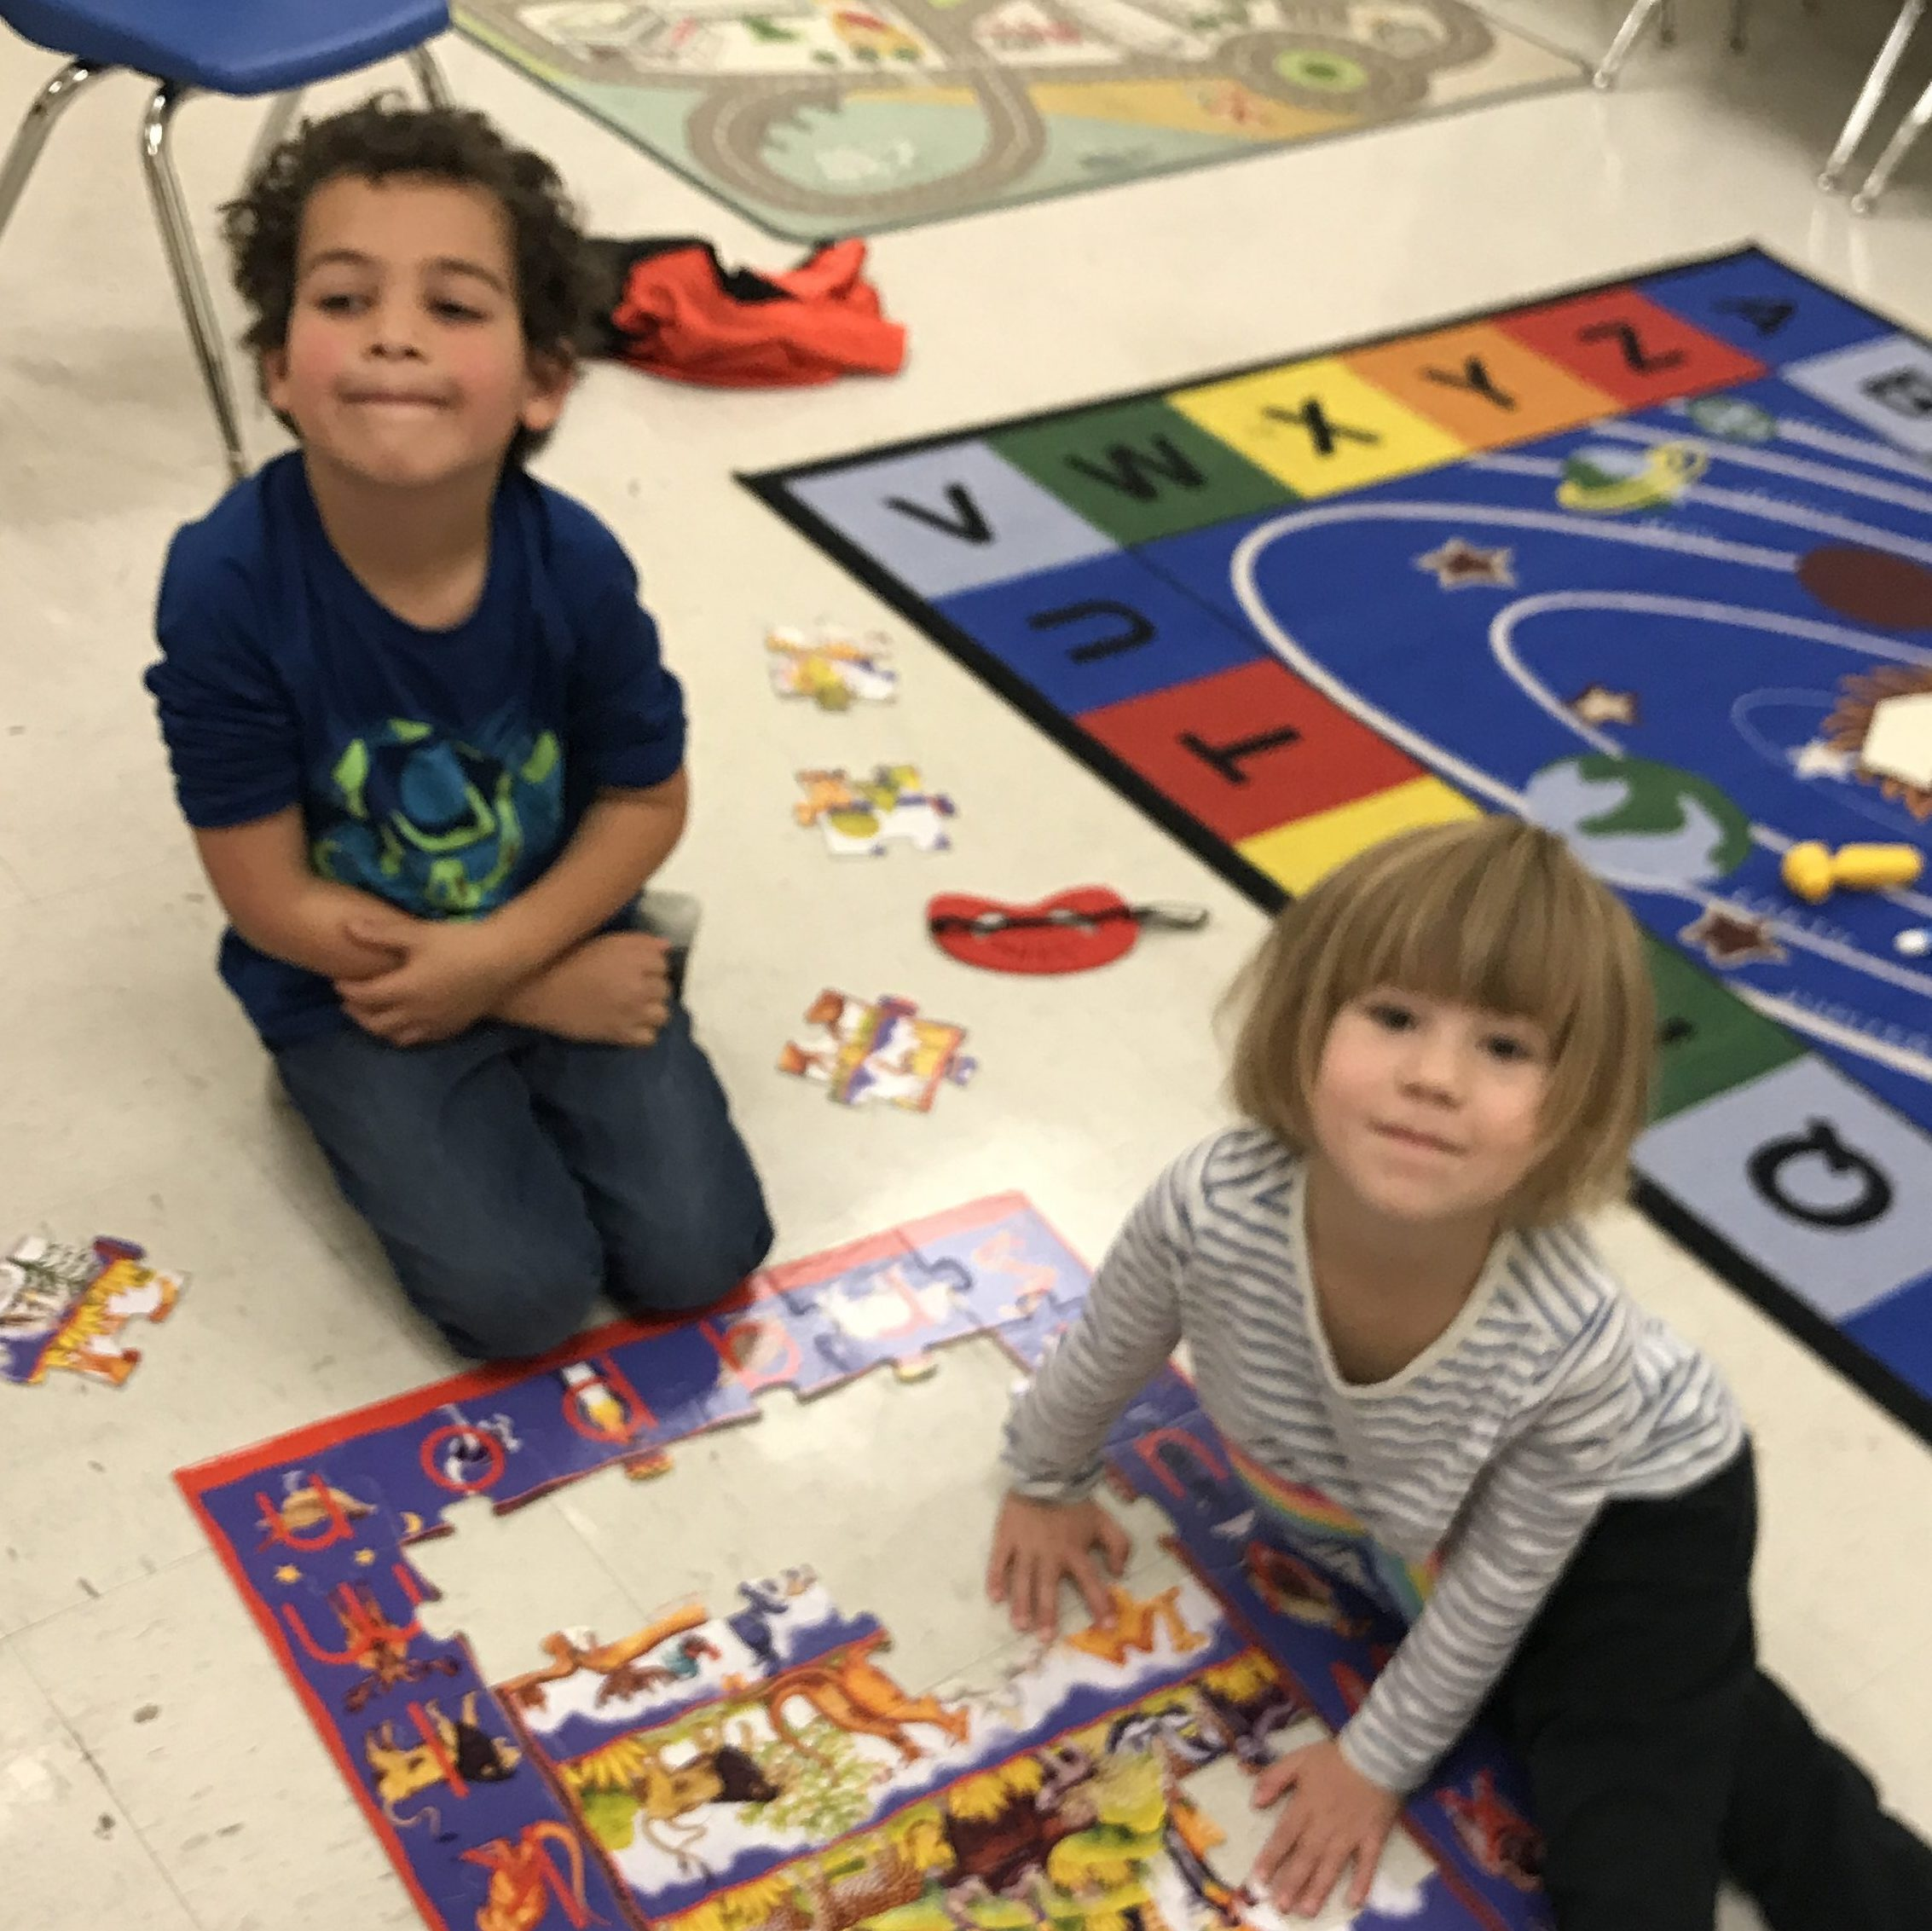 2 preschoolers playing on the floor of the nursery